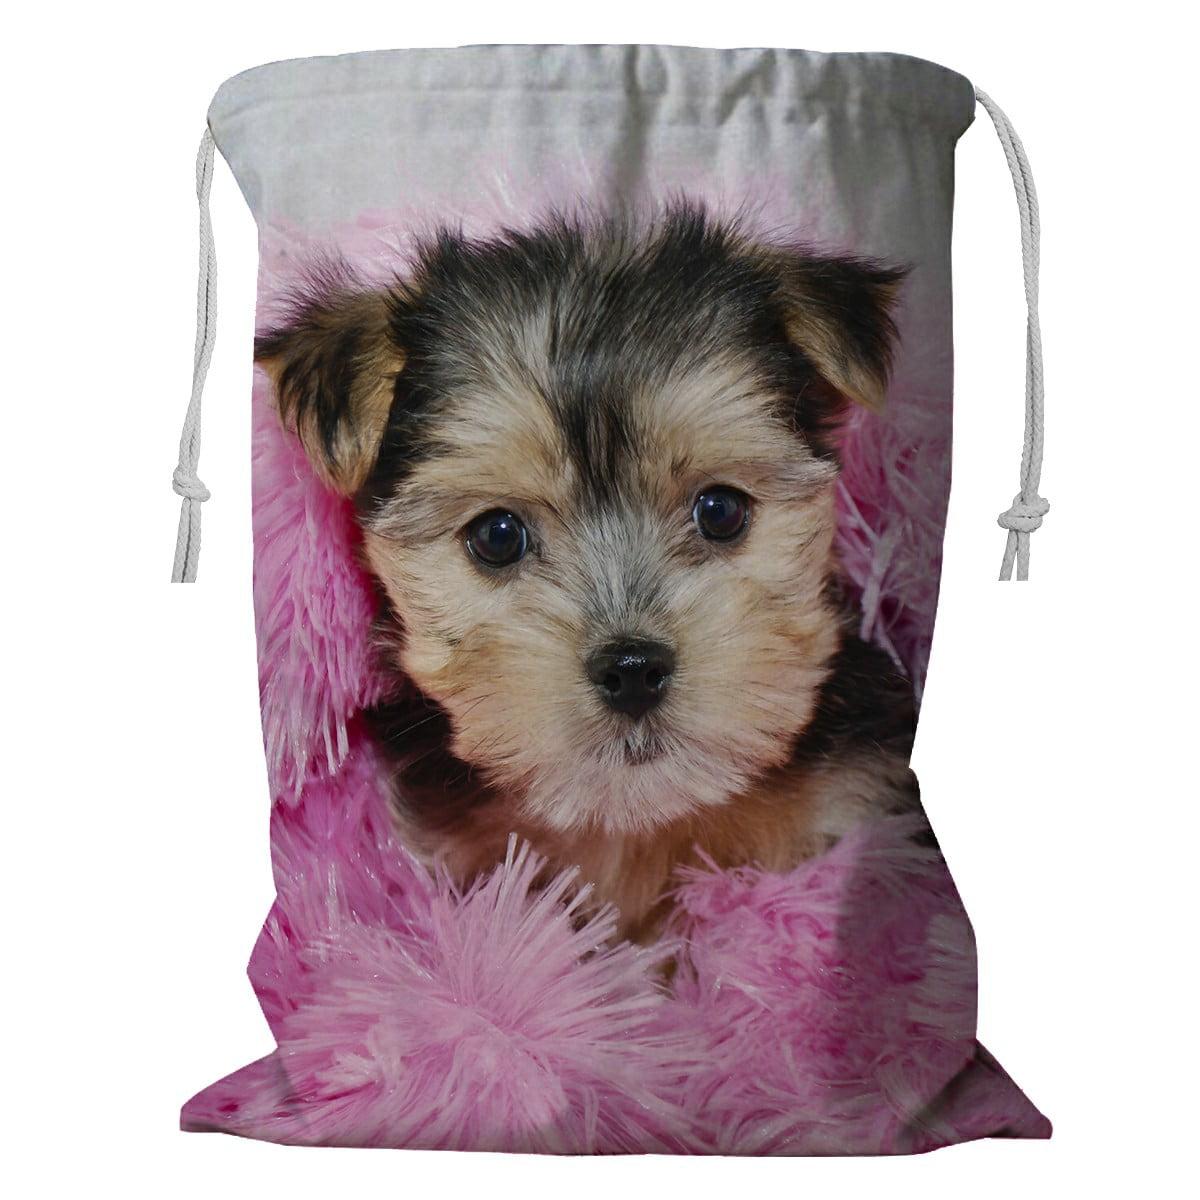 Eczjnt Cute Morkie Puppy Snuggled In A Pink Blanket Storage Basket Laundry Bag With Drawstring 24x32 Inch Walmart Com Walmart Com